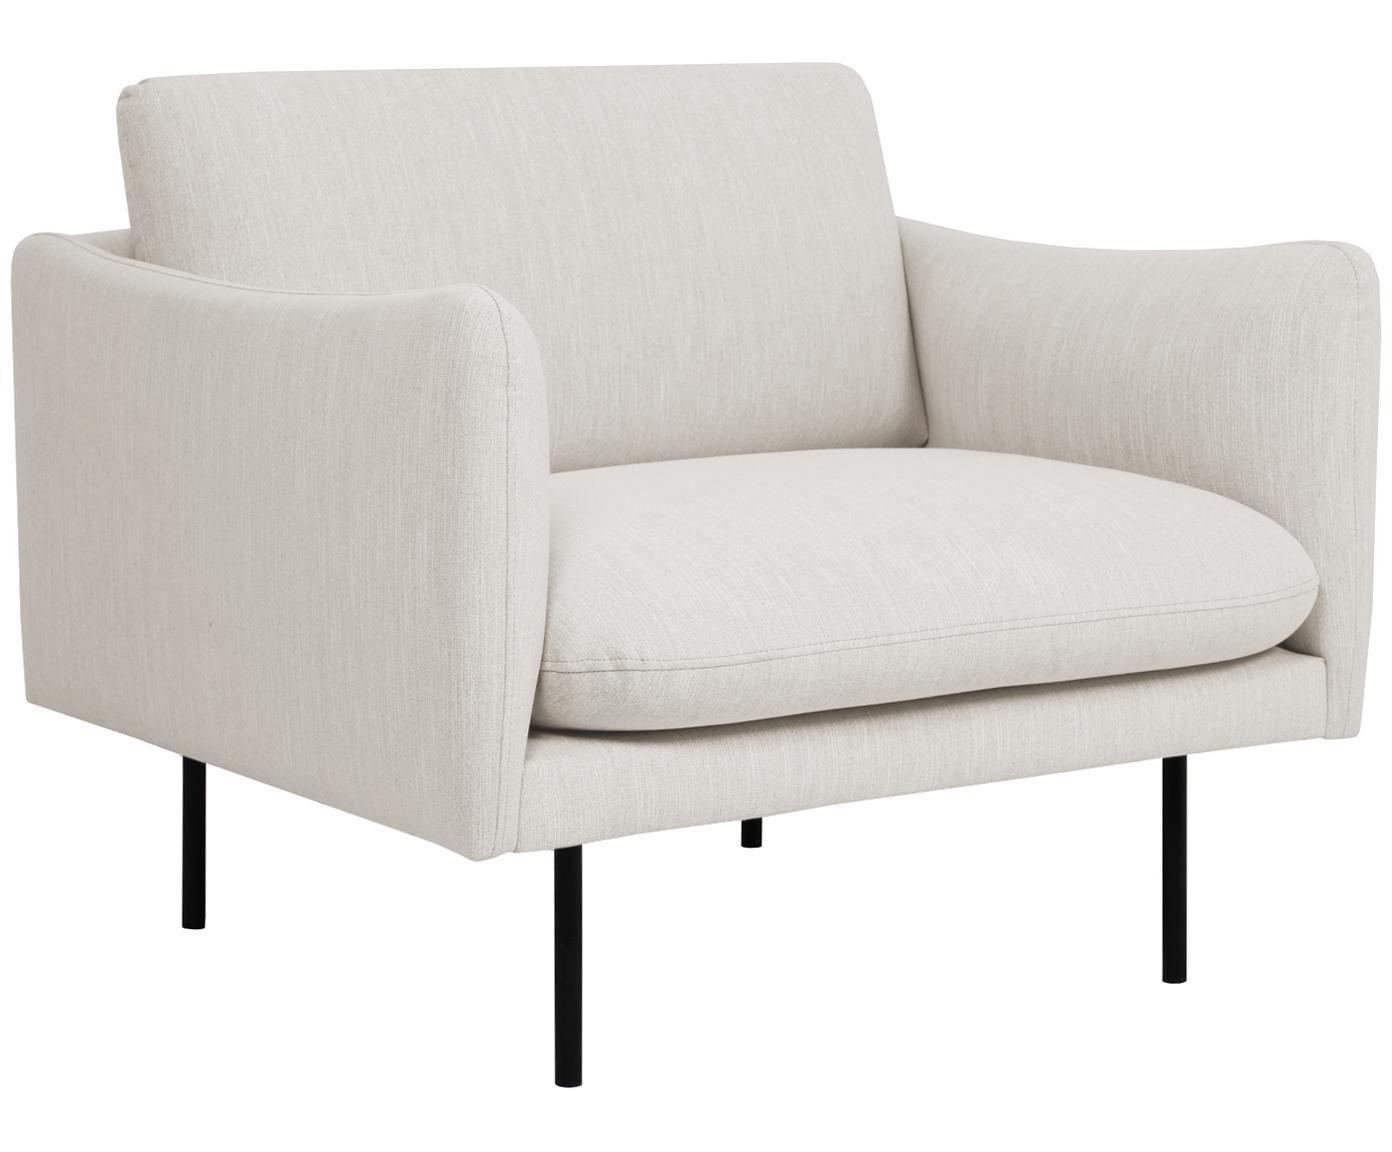 Sessel Moby, Bezug: Polyester 60.000 Scheuert, Gestell: Massives Kiefernholz, Webstoff Beige, B 90 x T 90 cm